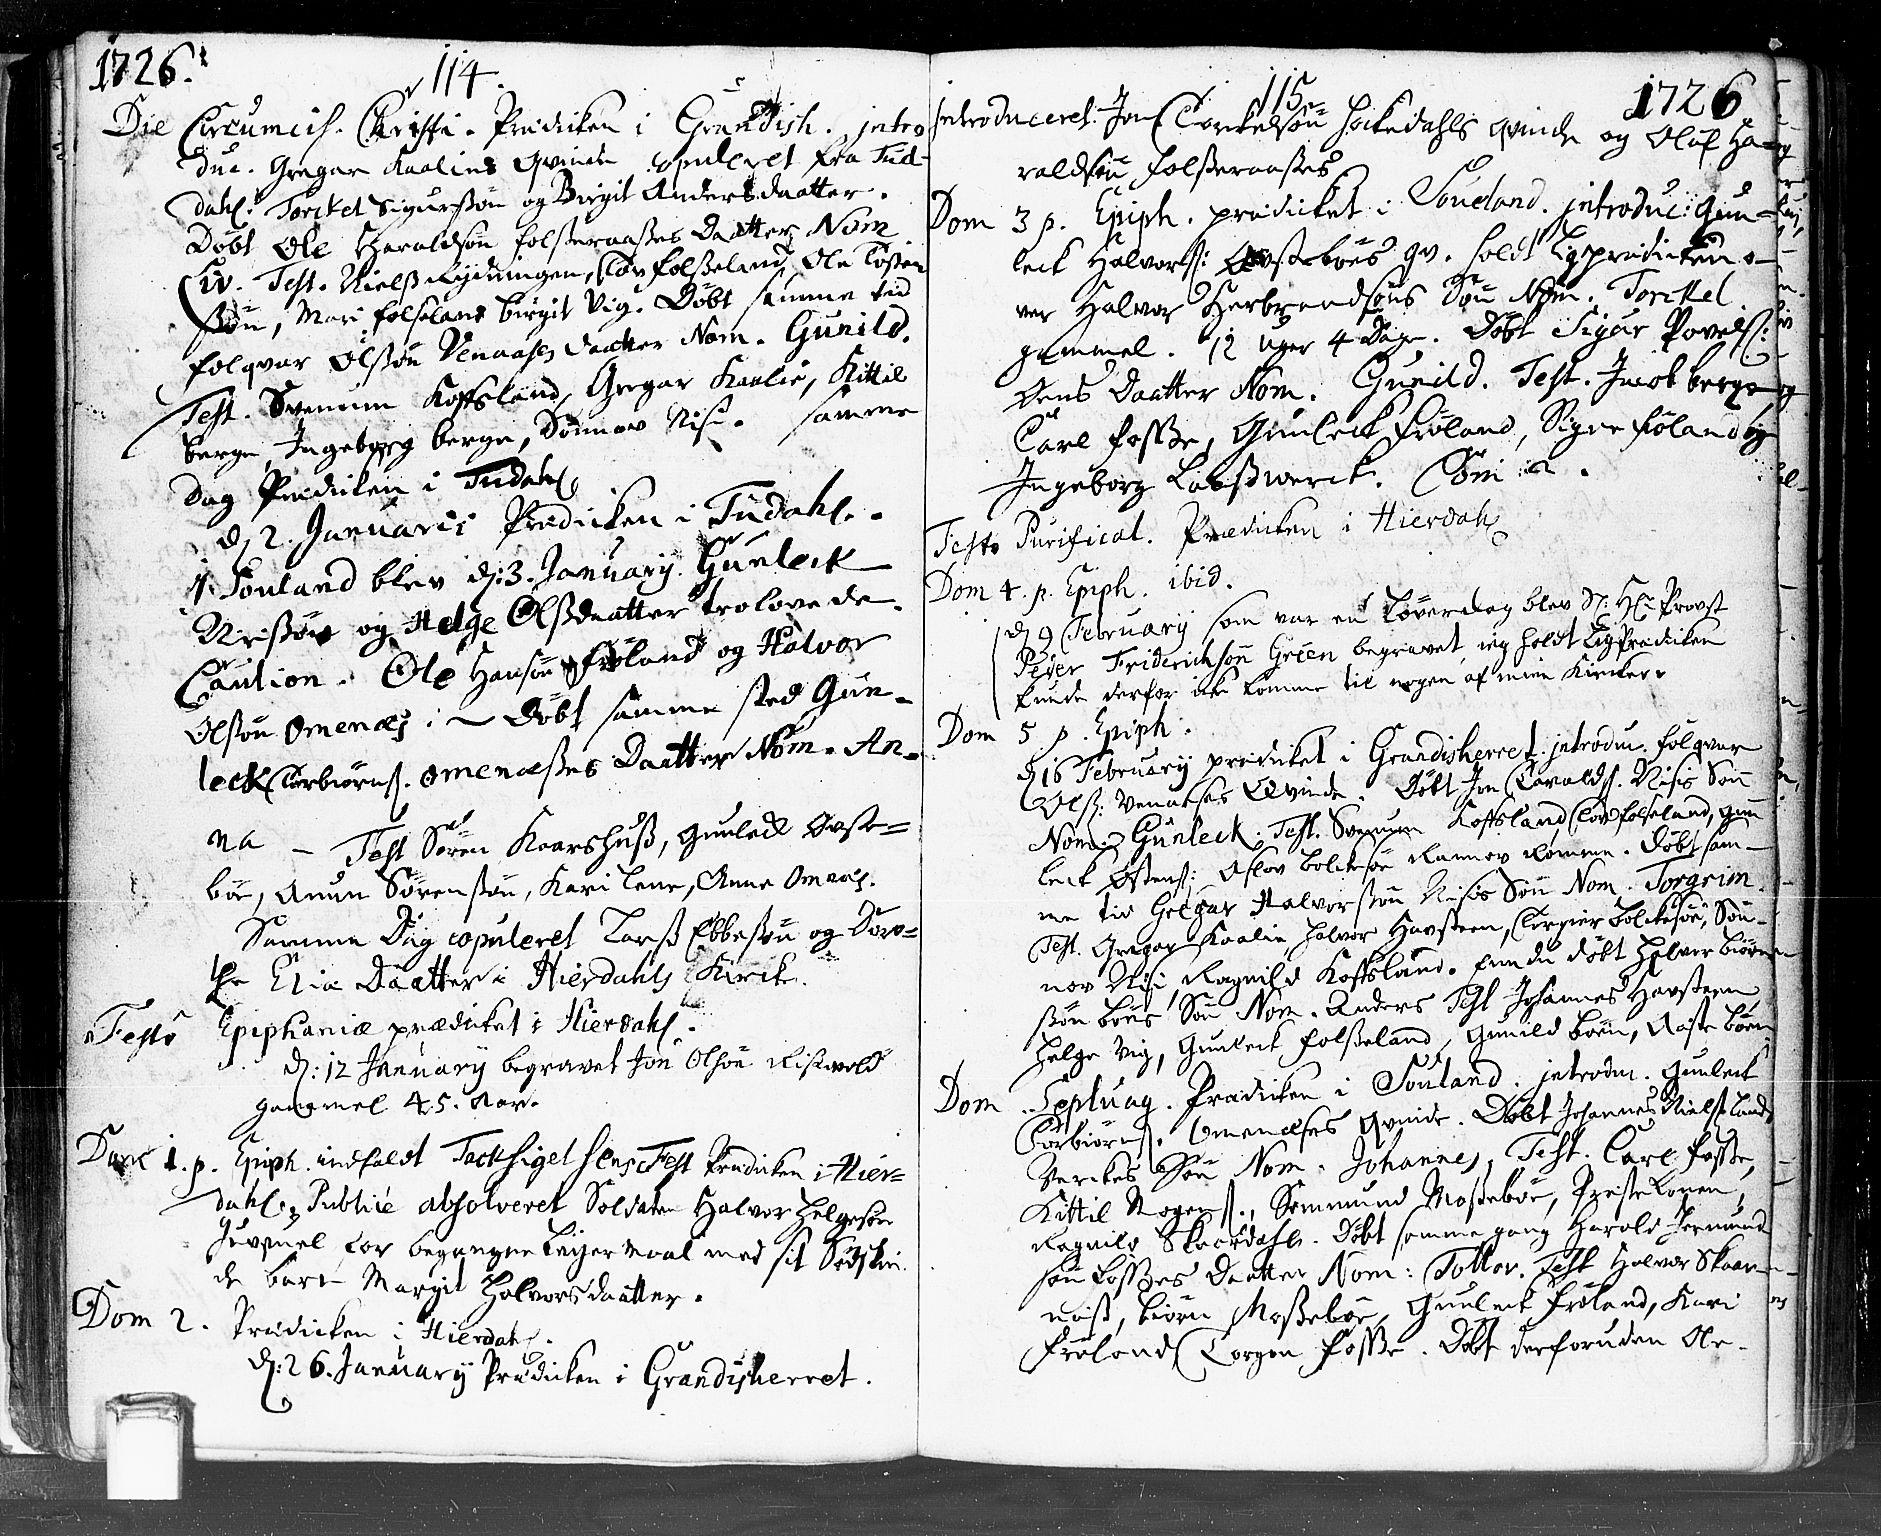 SAKO, Hjartdal kirkebøker, F/Fa/L0002: Ministerialbok nr. I 2, 1716-1754, s. 114-115